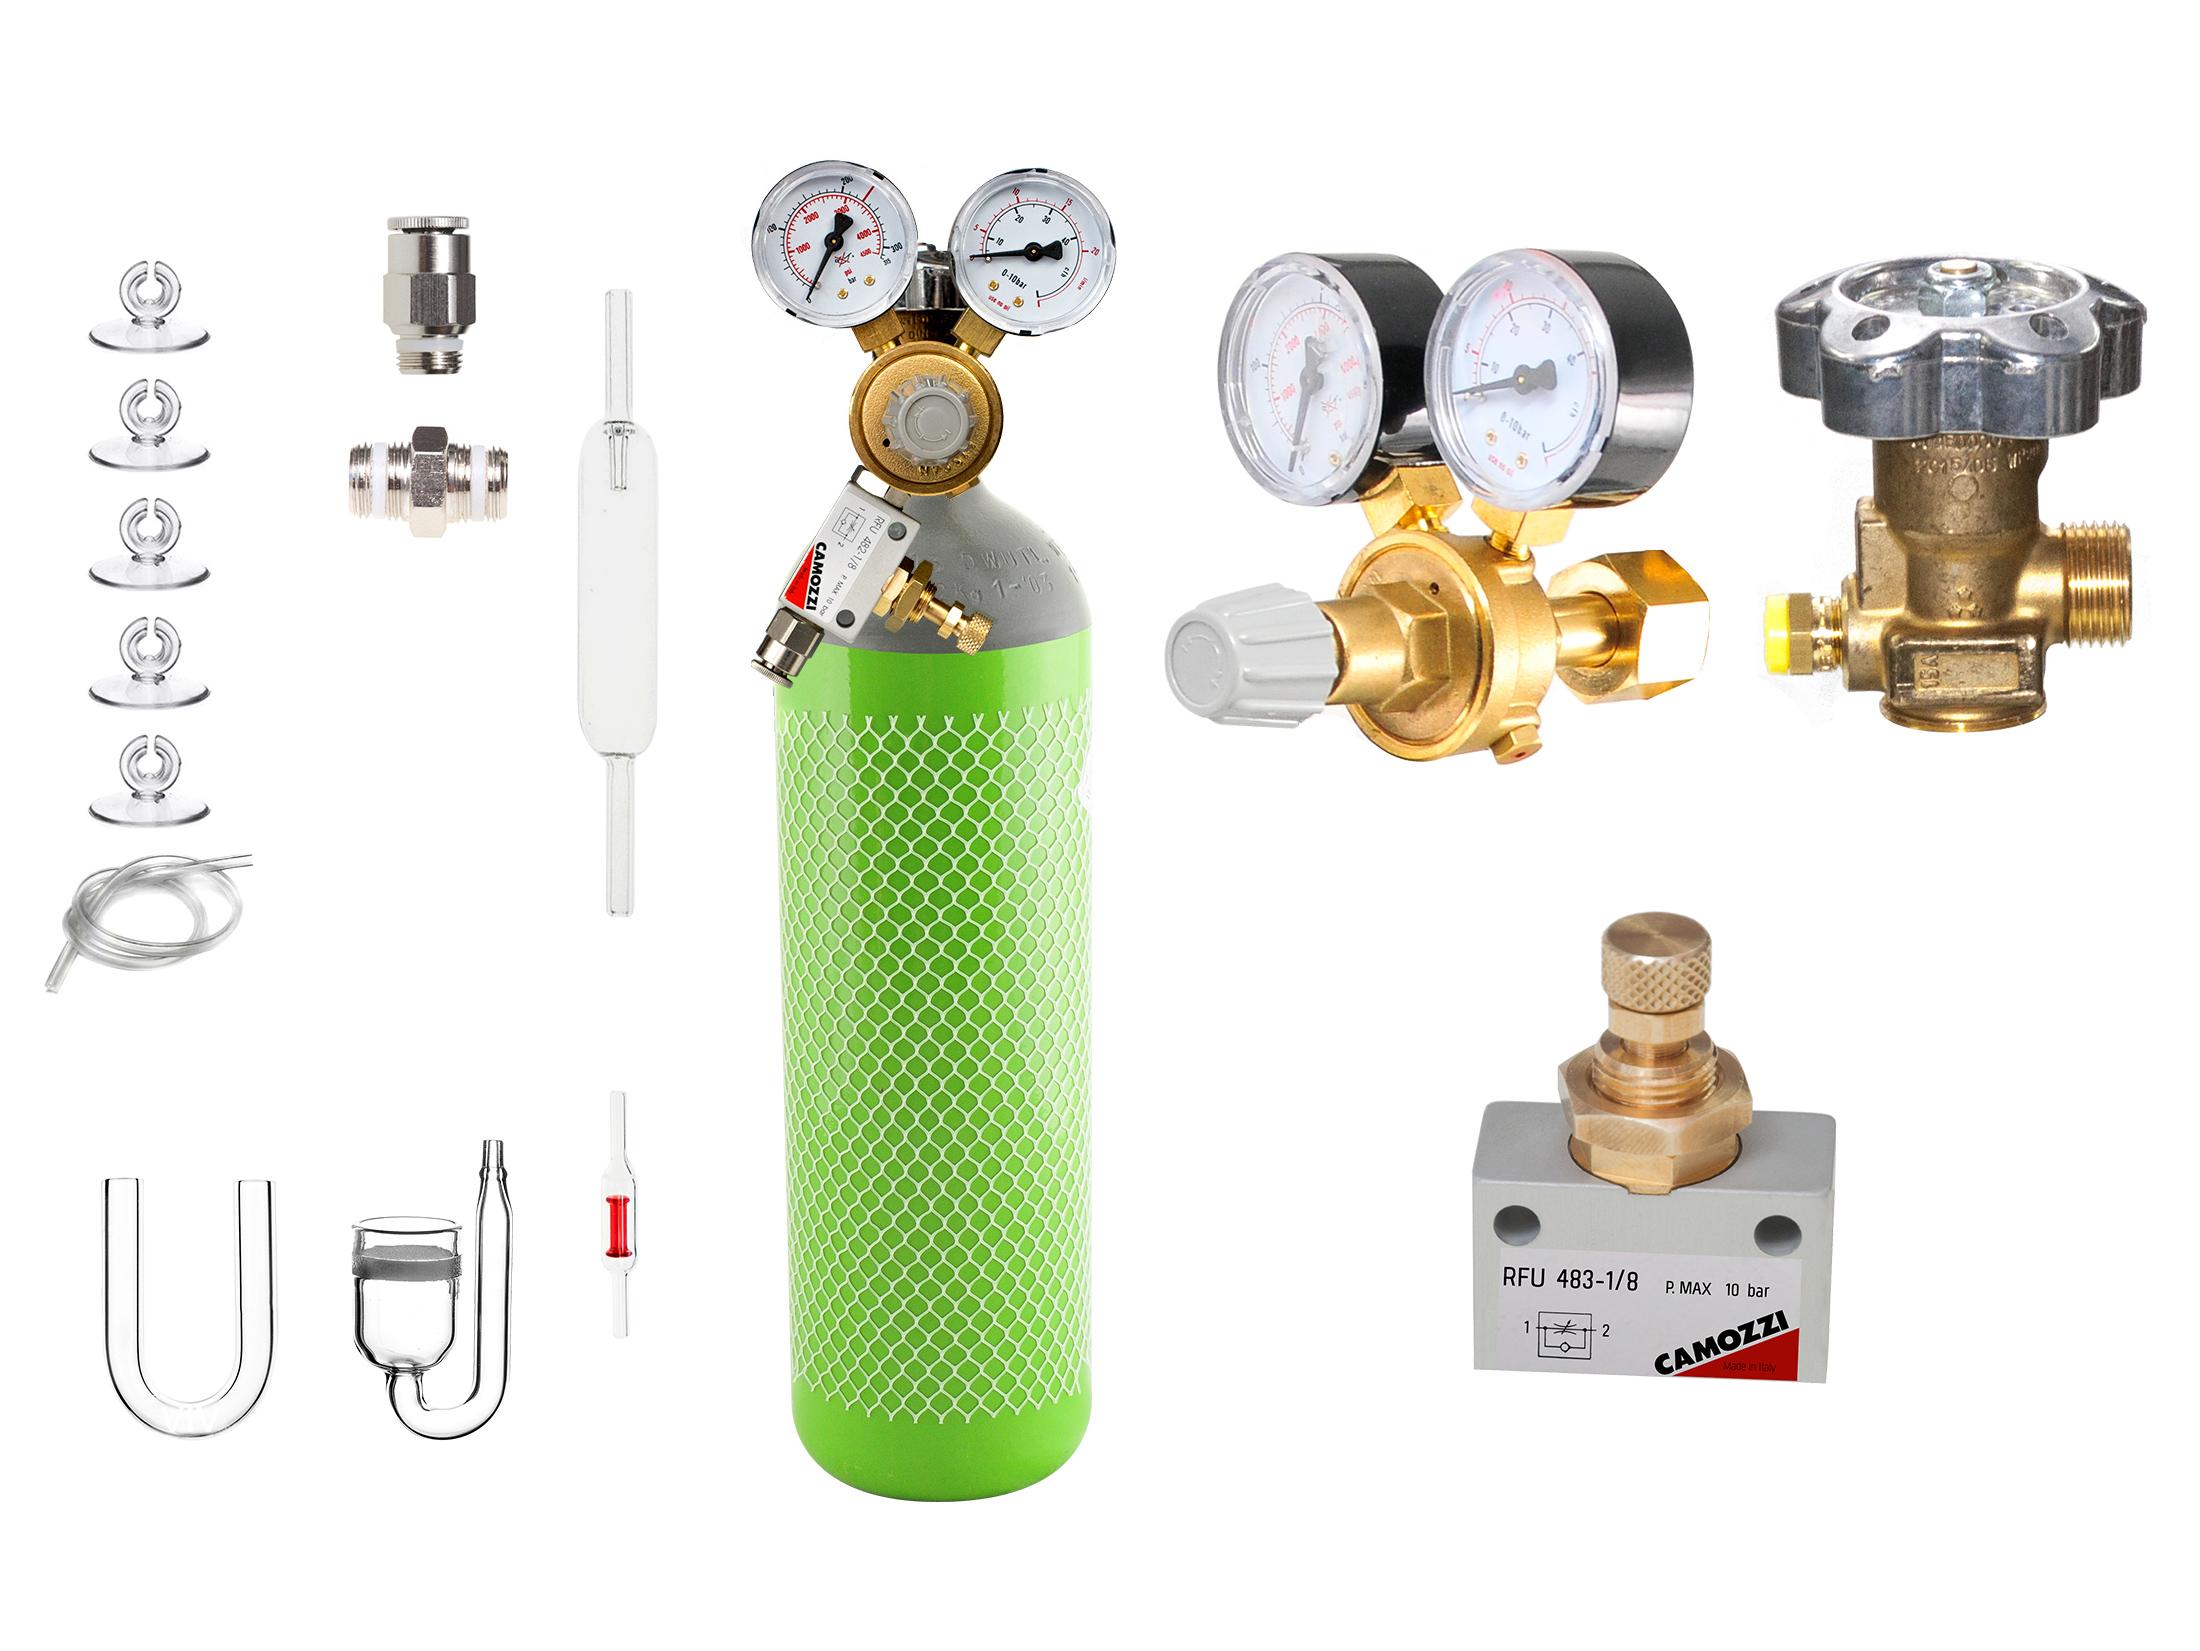 Набор AQUA PLANTER SMART CO2 с баллоном 1,5 кг 2,1 л